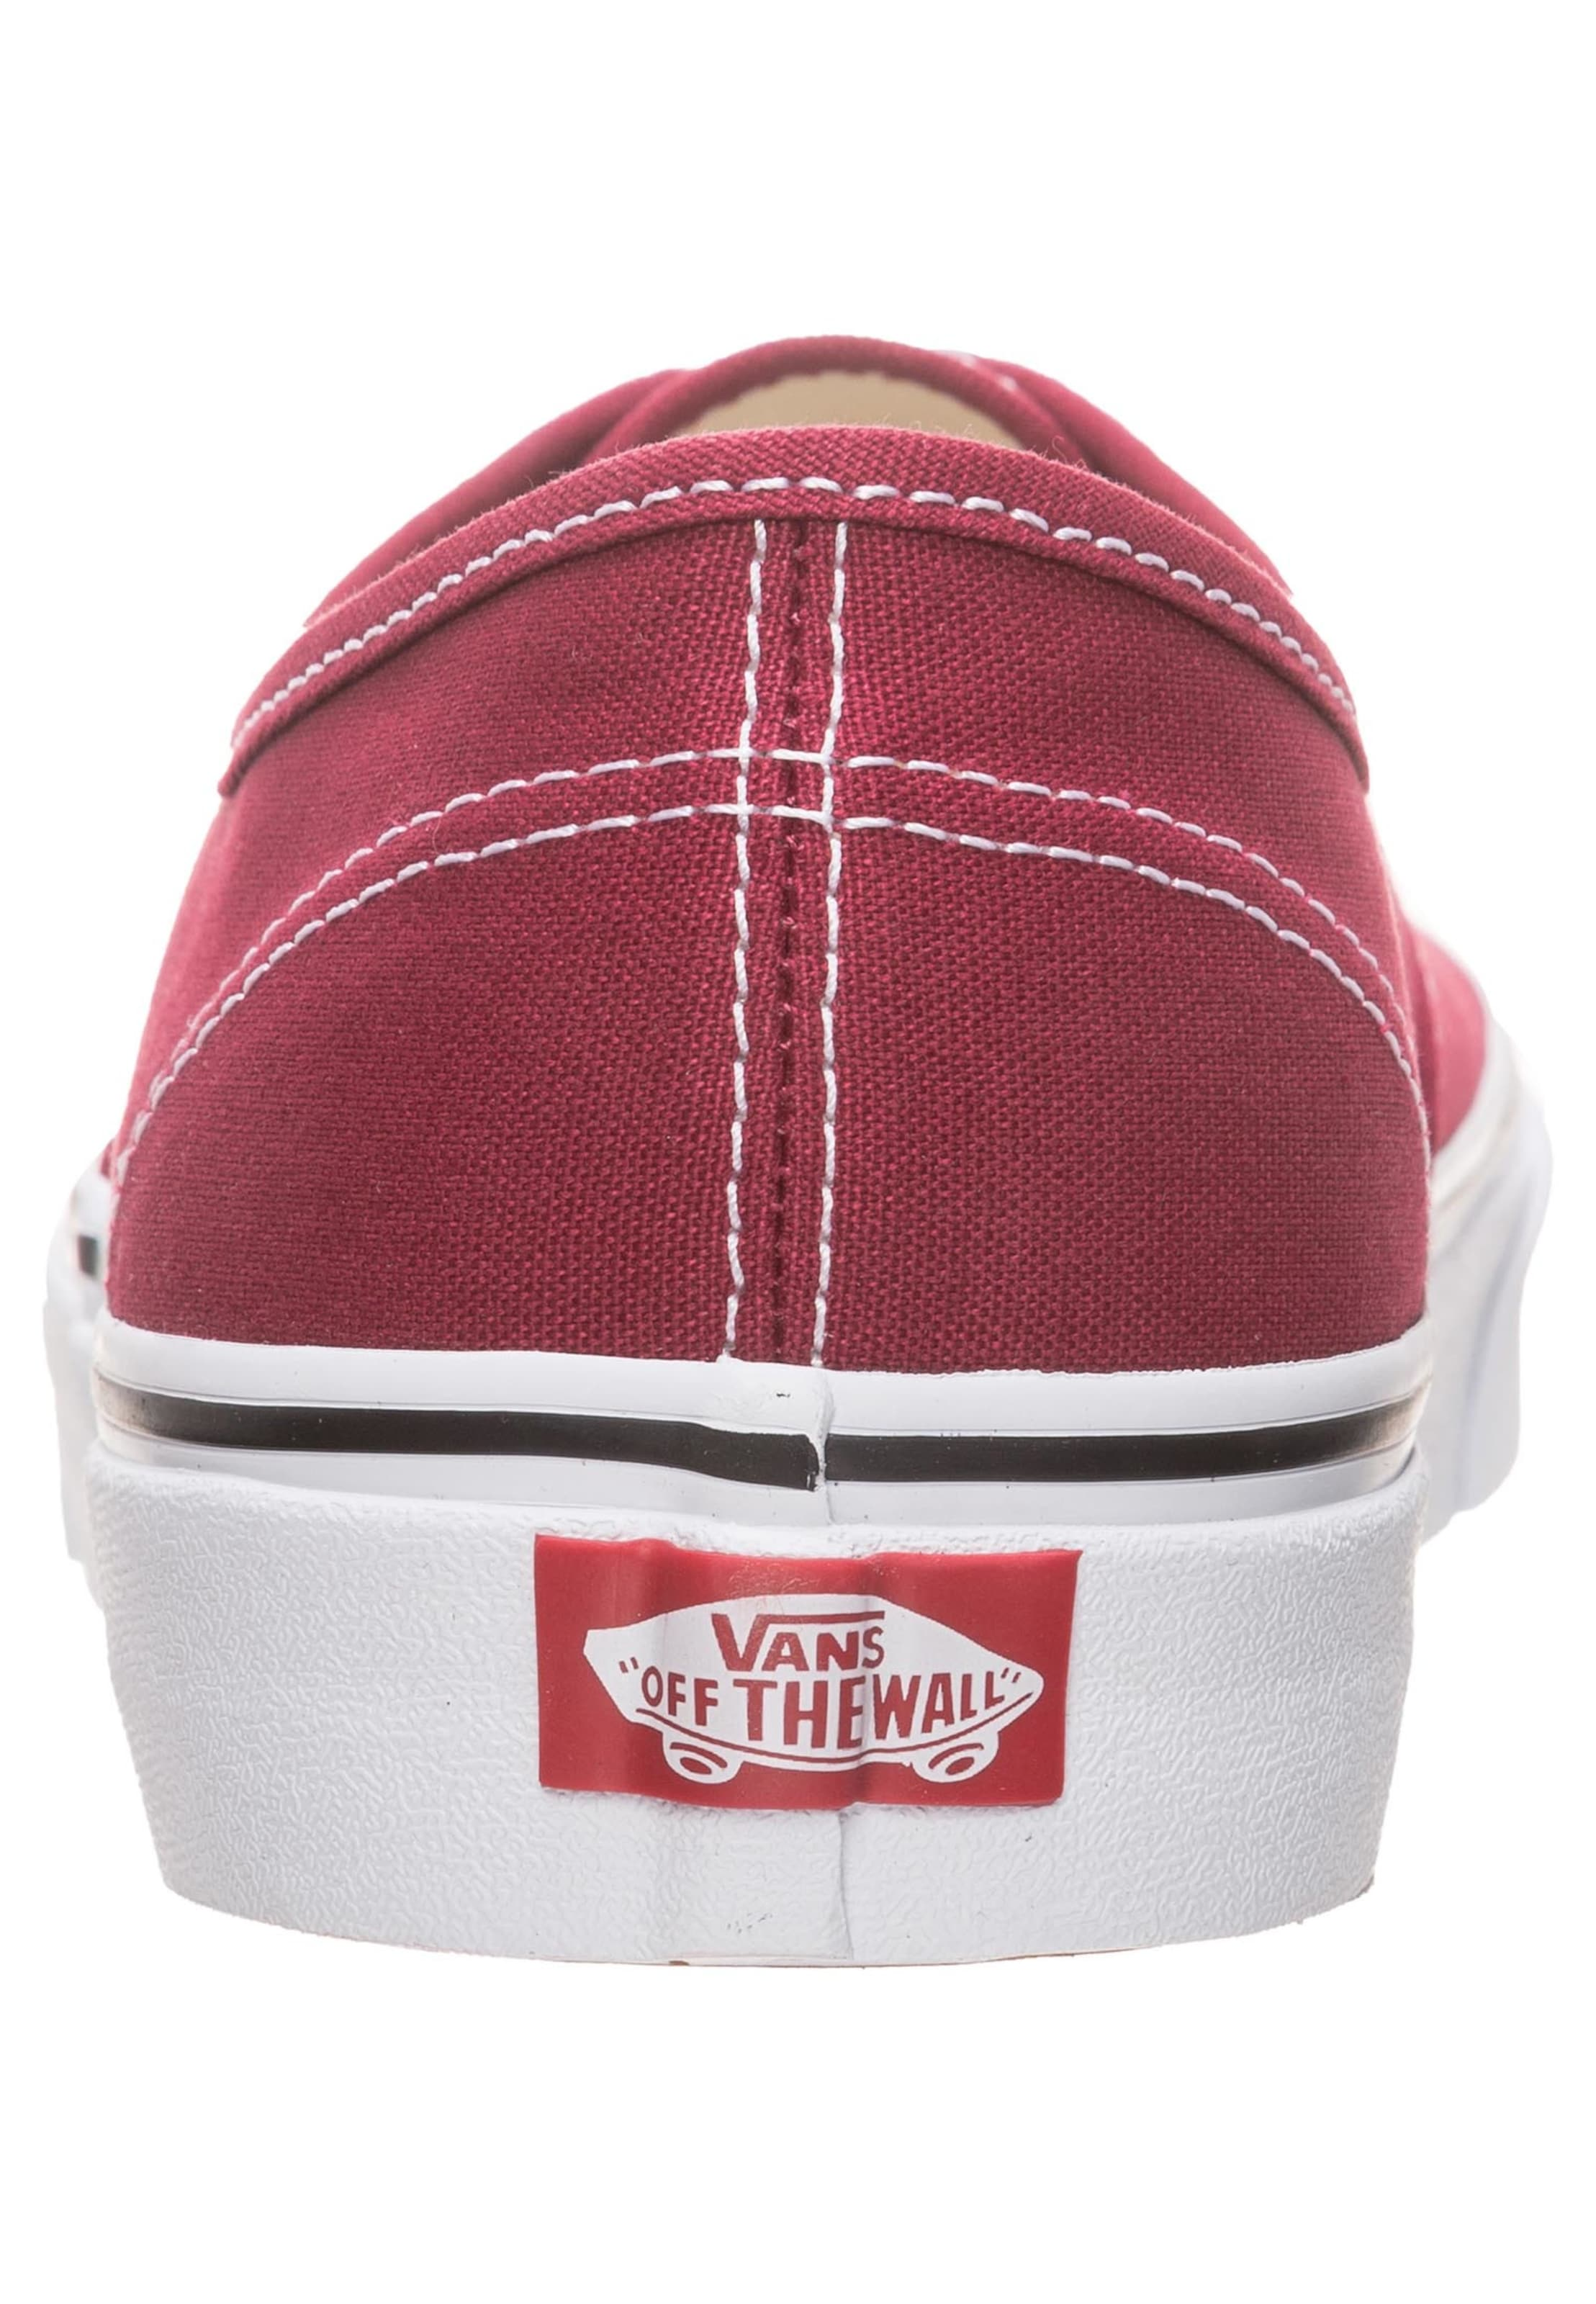 'authentic' Karminrot Sneaker 'authentic' Vans In 'authentic' Karminrot Vans Vans In Sneaker Sneaker gvb76yfY